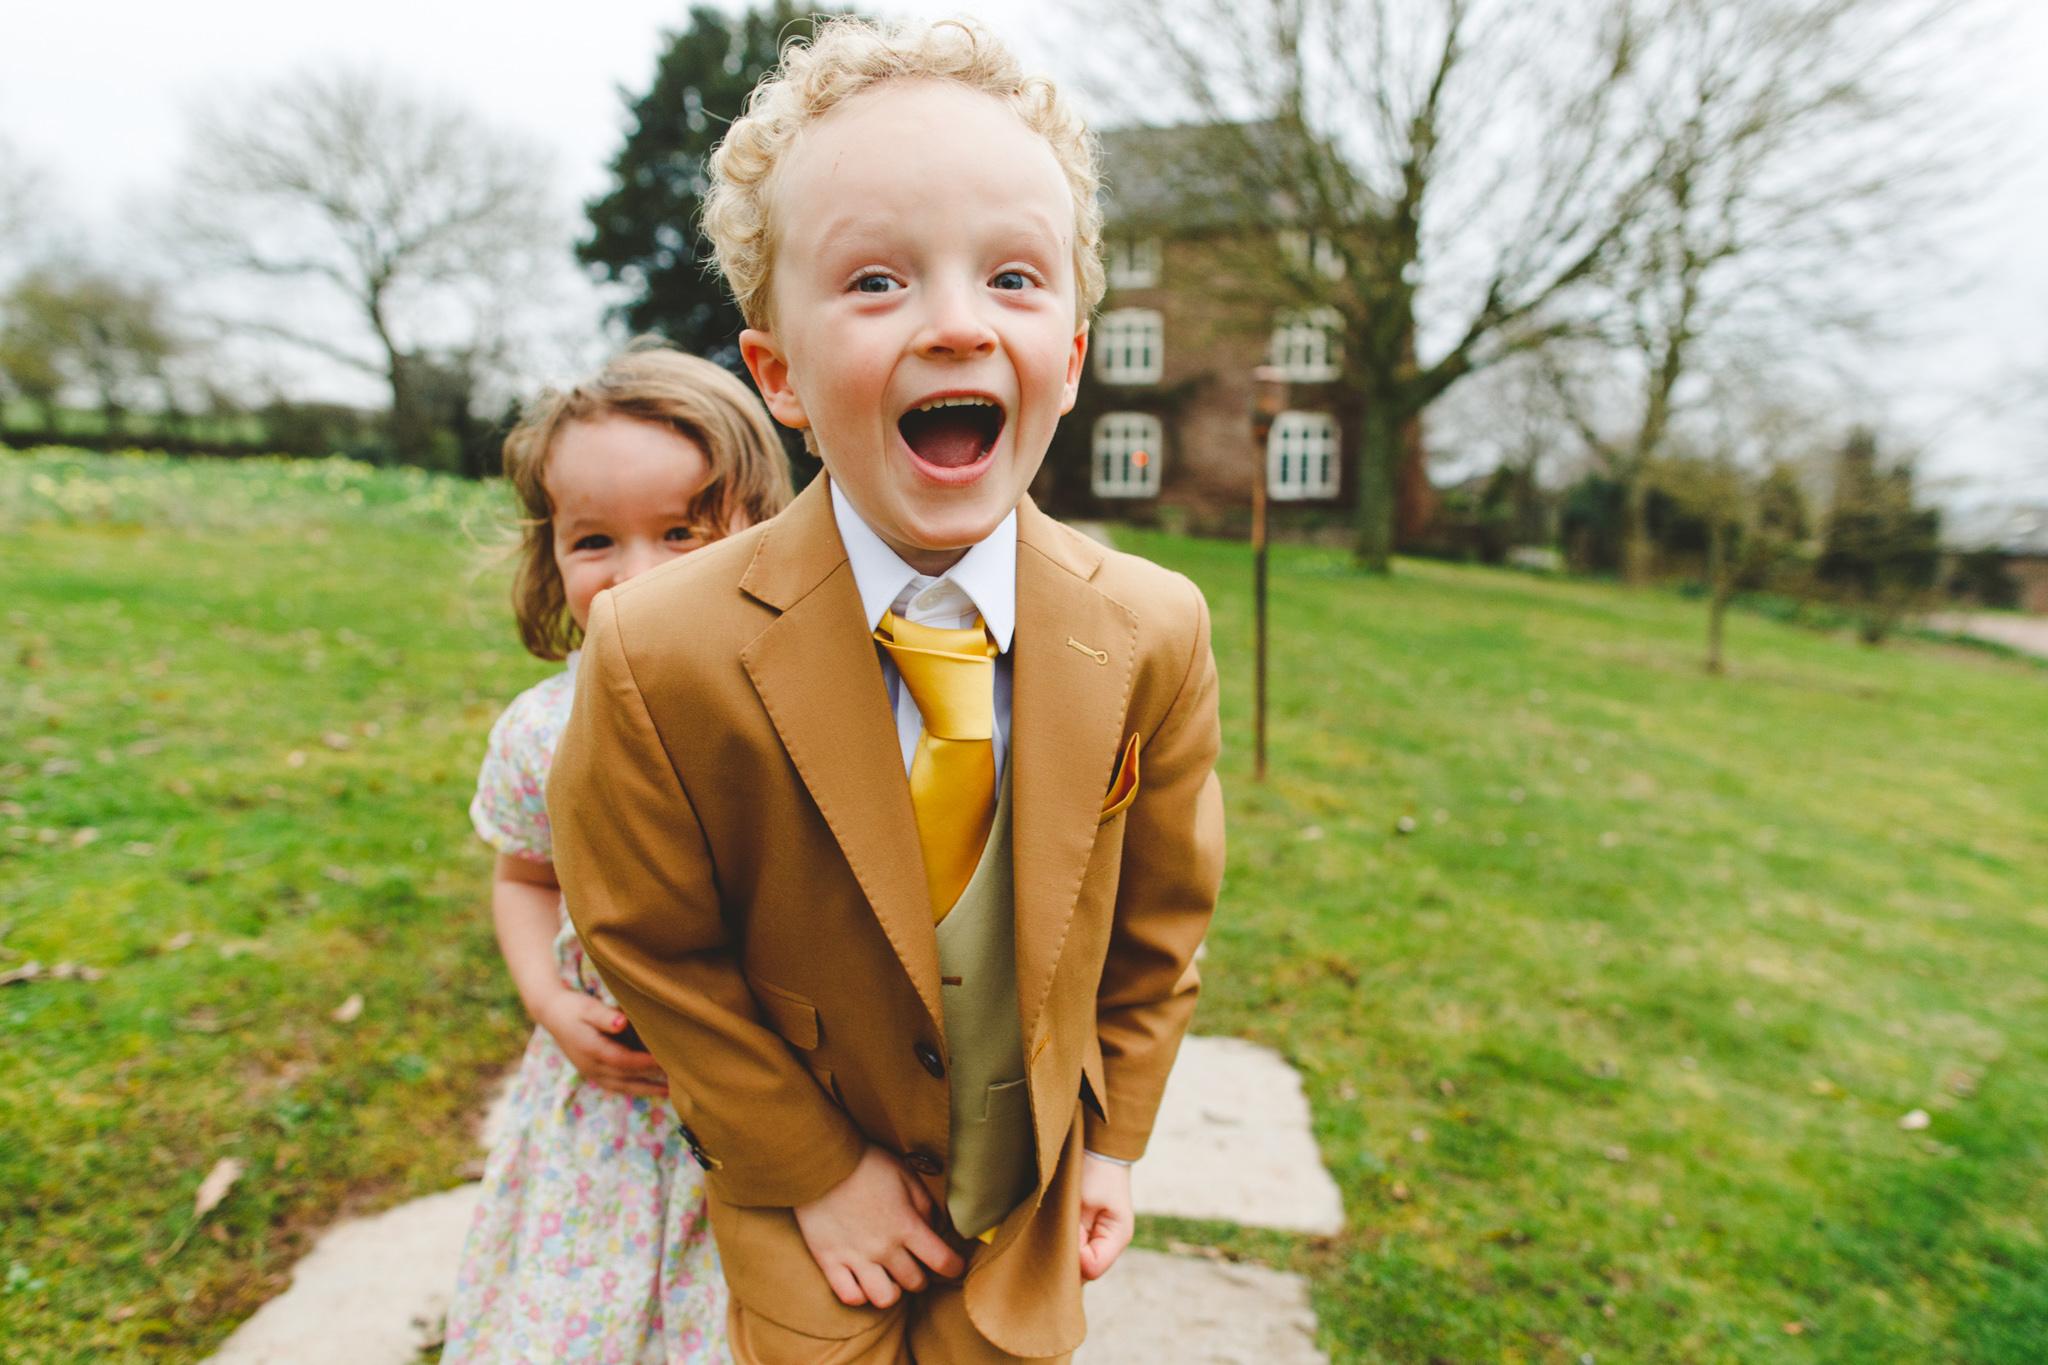 derbyshire-wedding-photographer-march-april-10.jpg